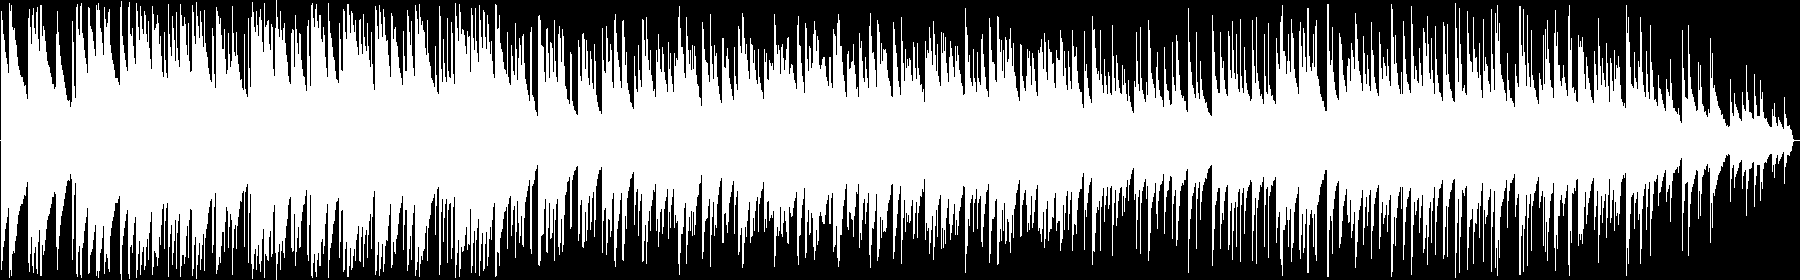 Polyrhythm audio waveform